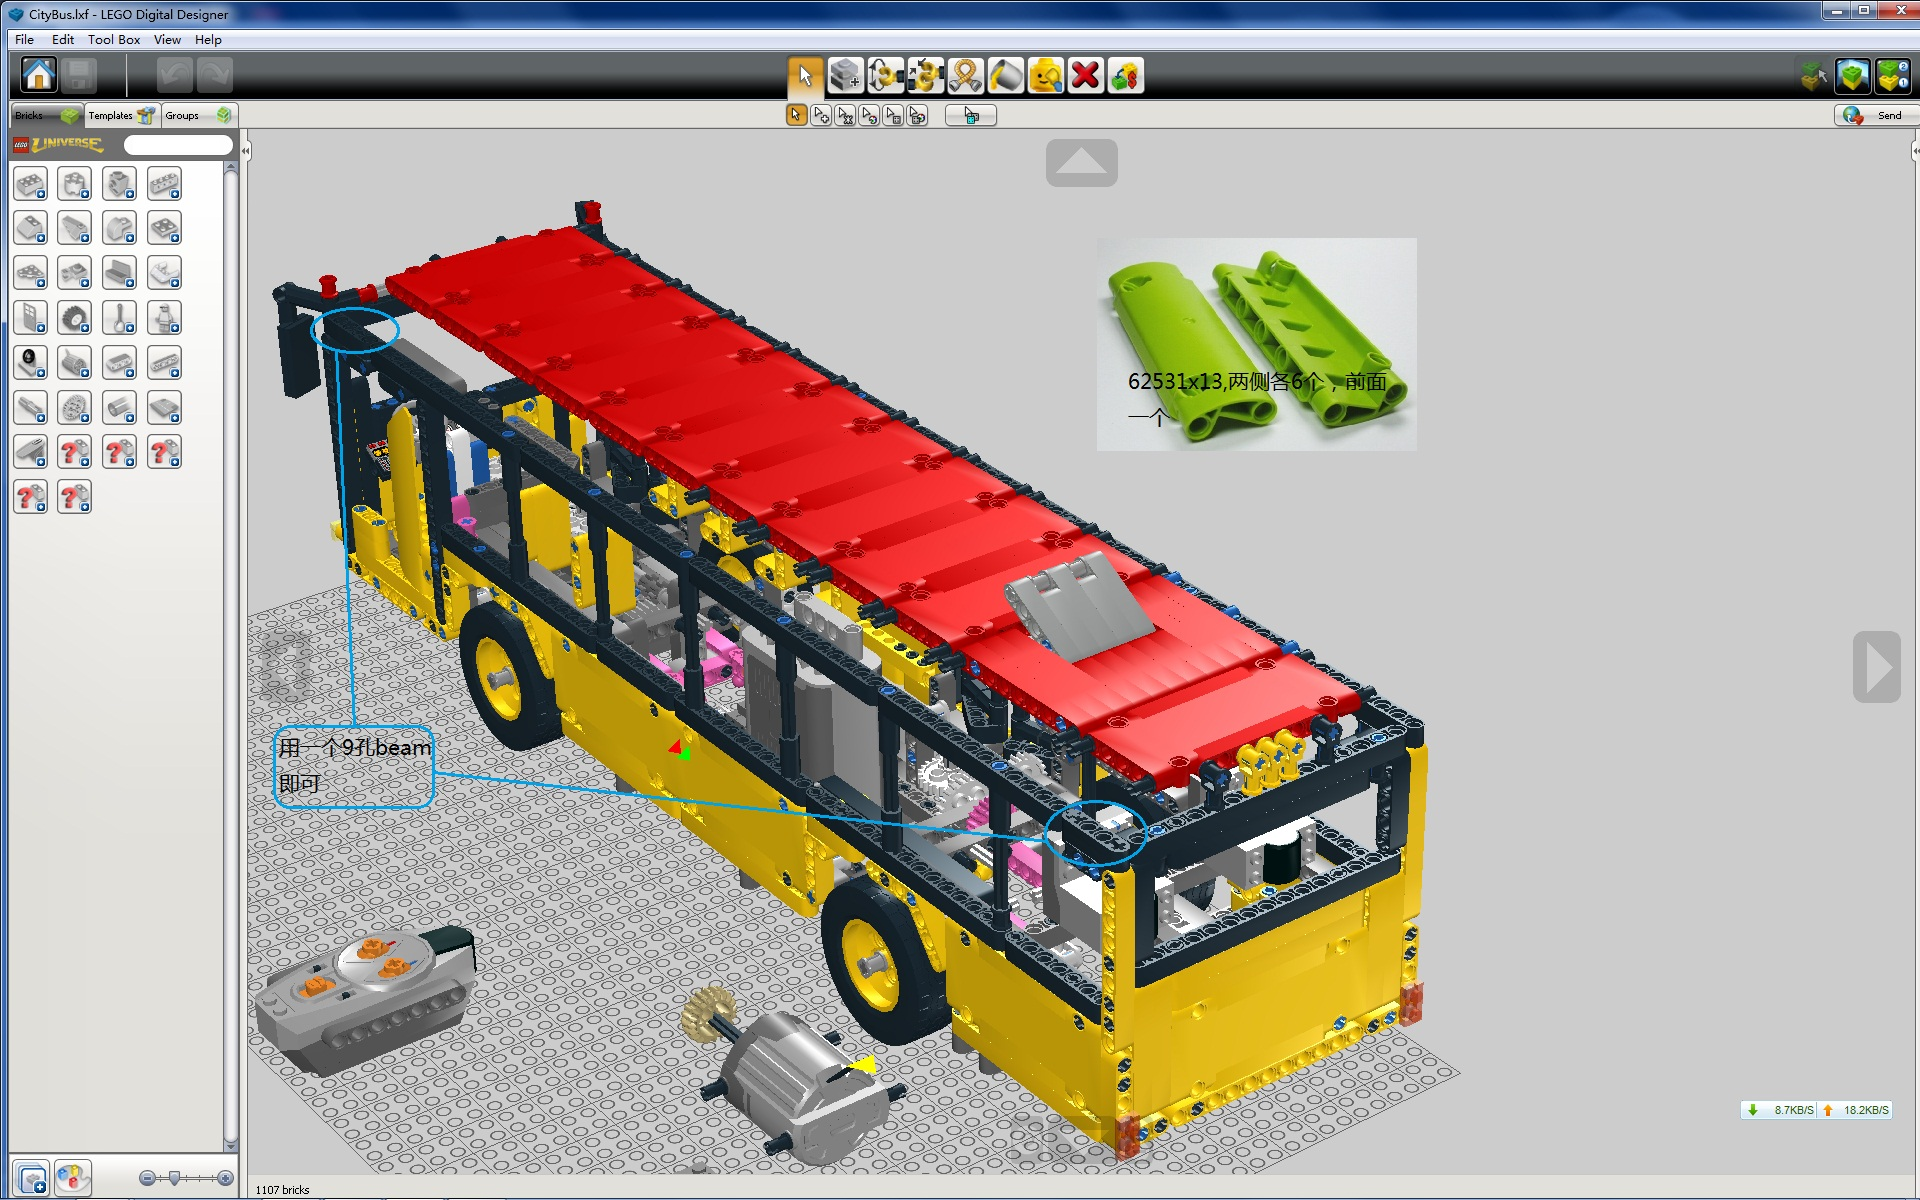 Moccity bus lego technic mindstorms model team eurobricks lddfix3g pronofoot35fo Images